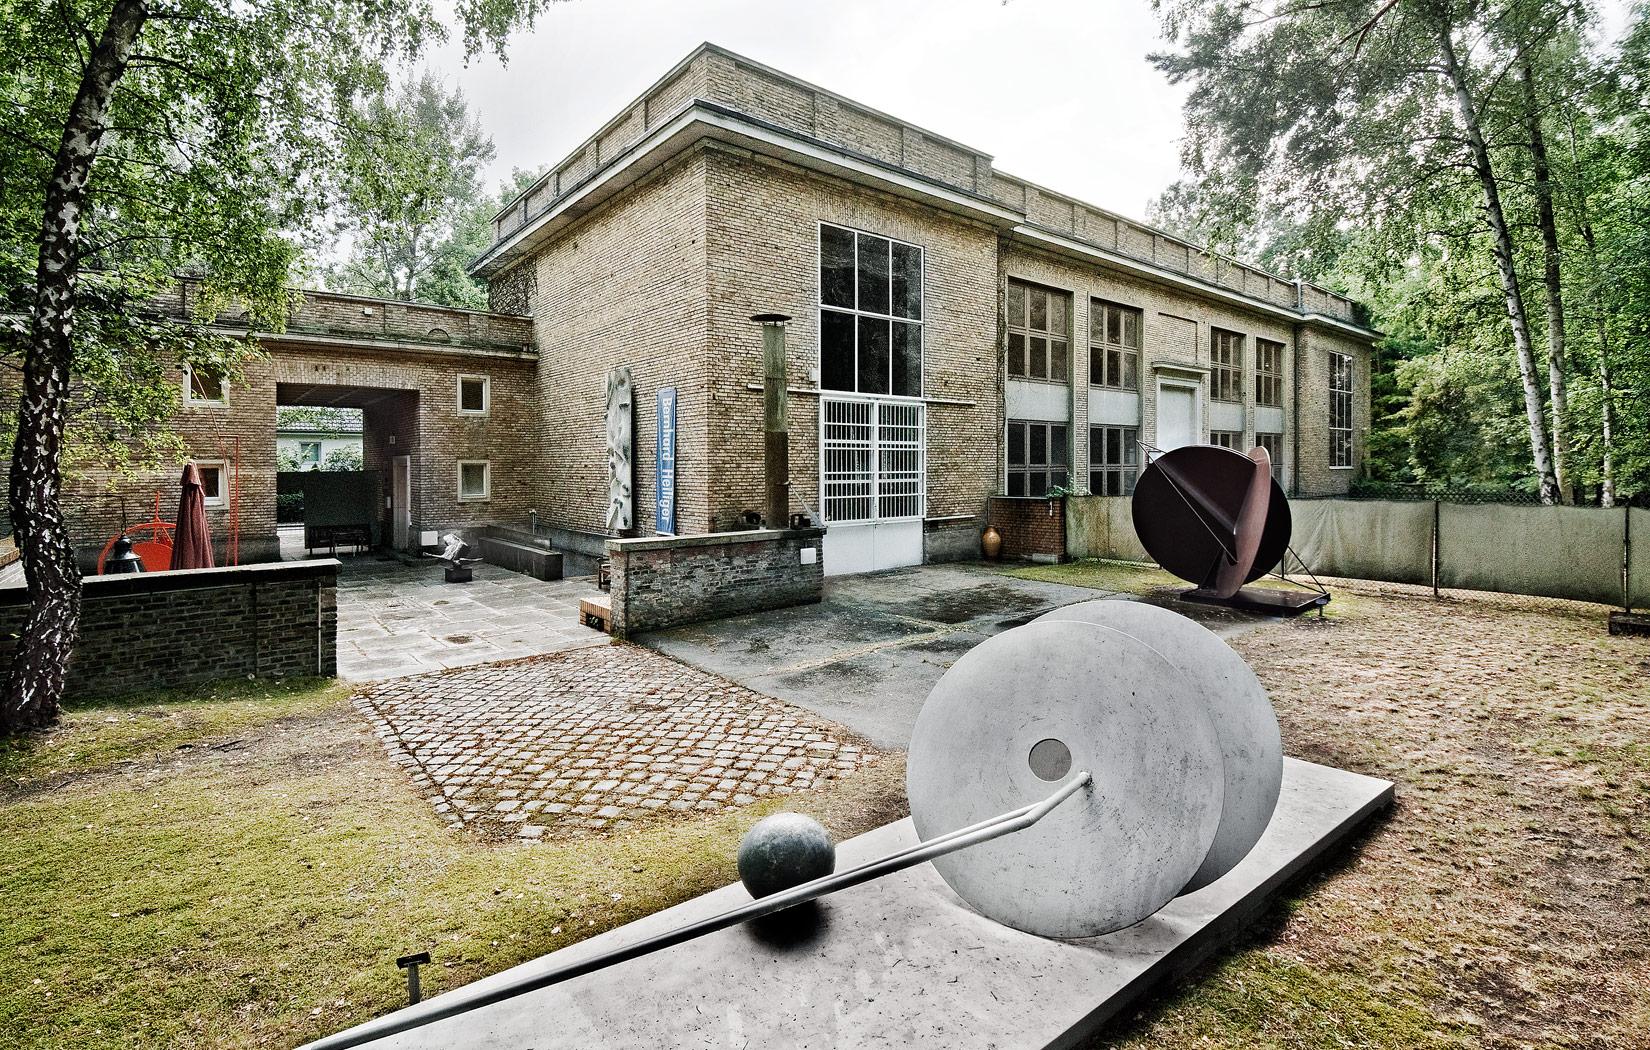 Kunsthaus-Dahlem-sculpture-garden,-Photography-Conrad-S-Klein